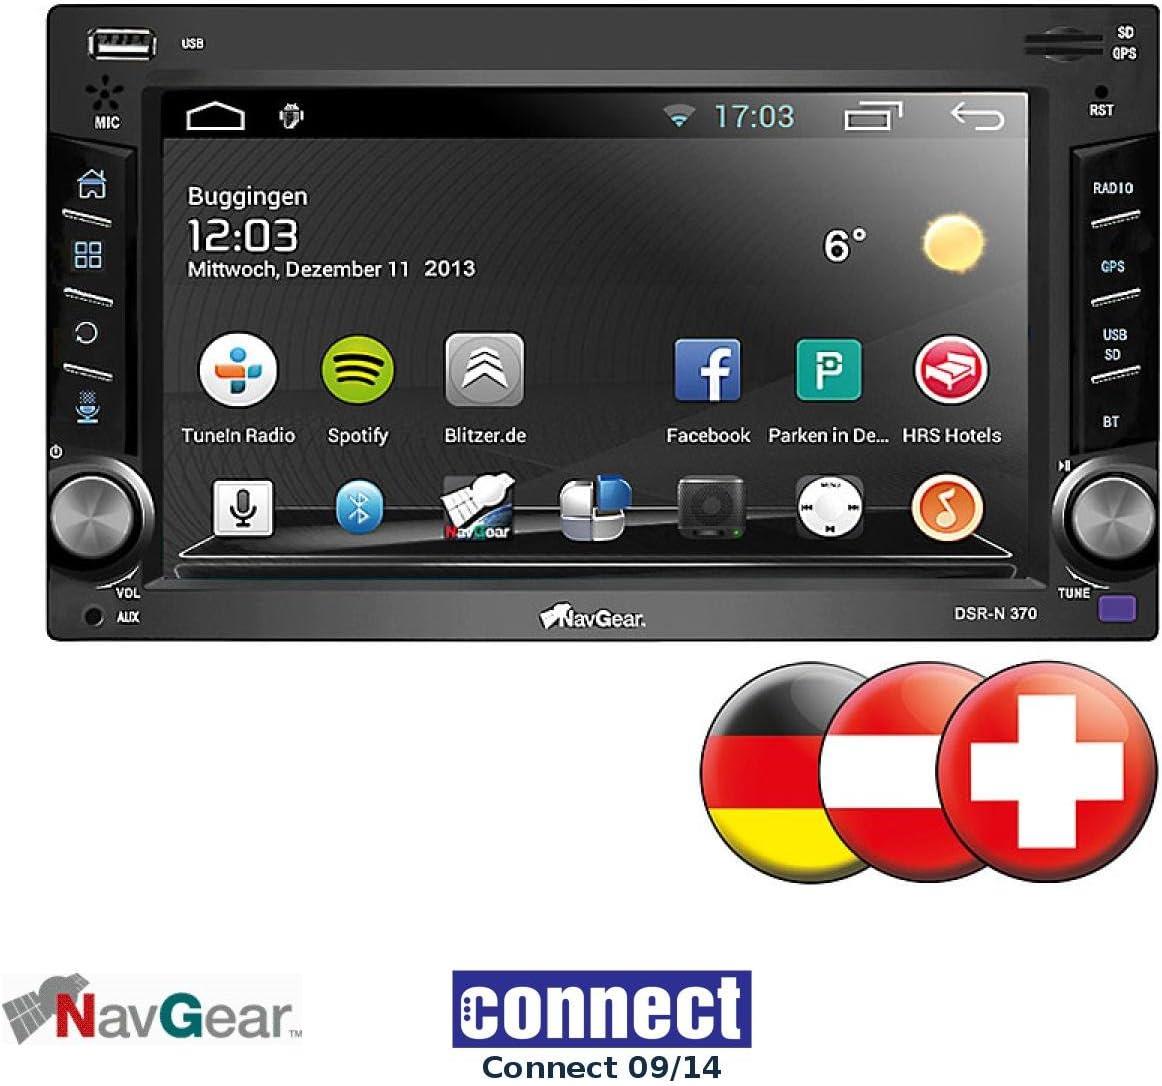 NavGear StreetMate de 2 din radio de coche con 6 de navi, DSR ...